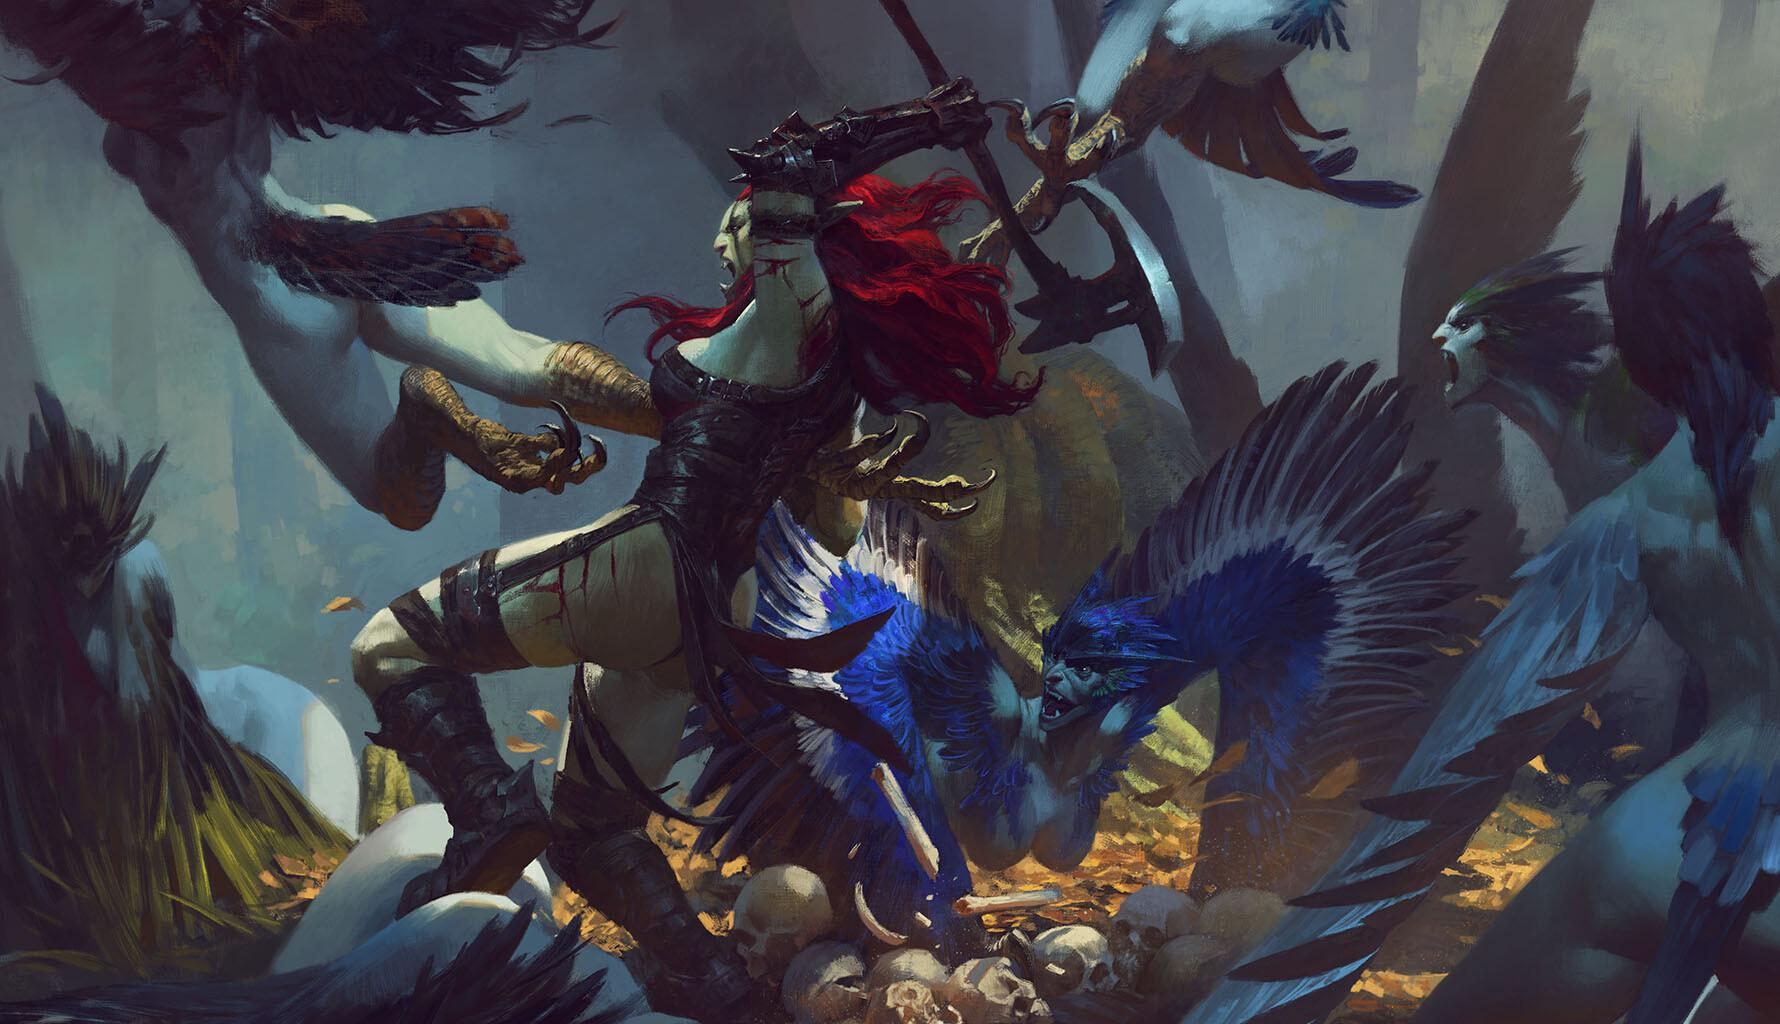 Bayard wu fighting in the harpy nest p03